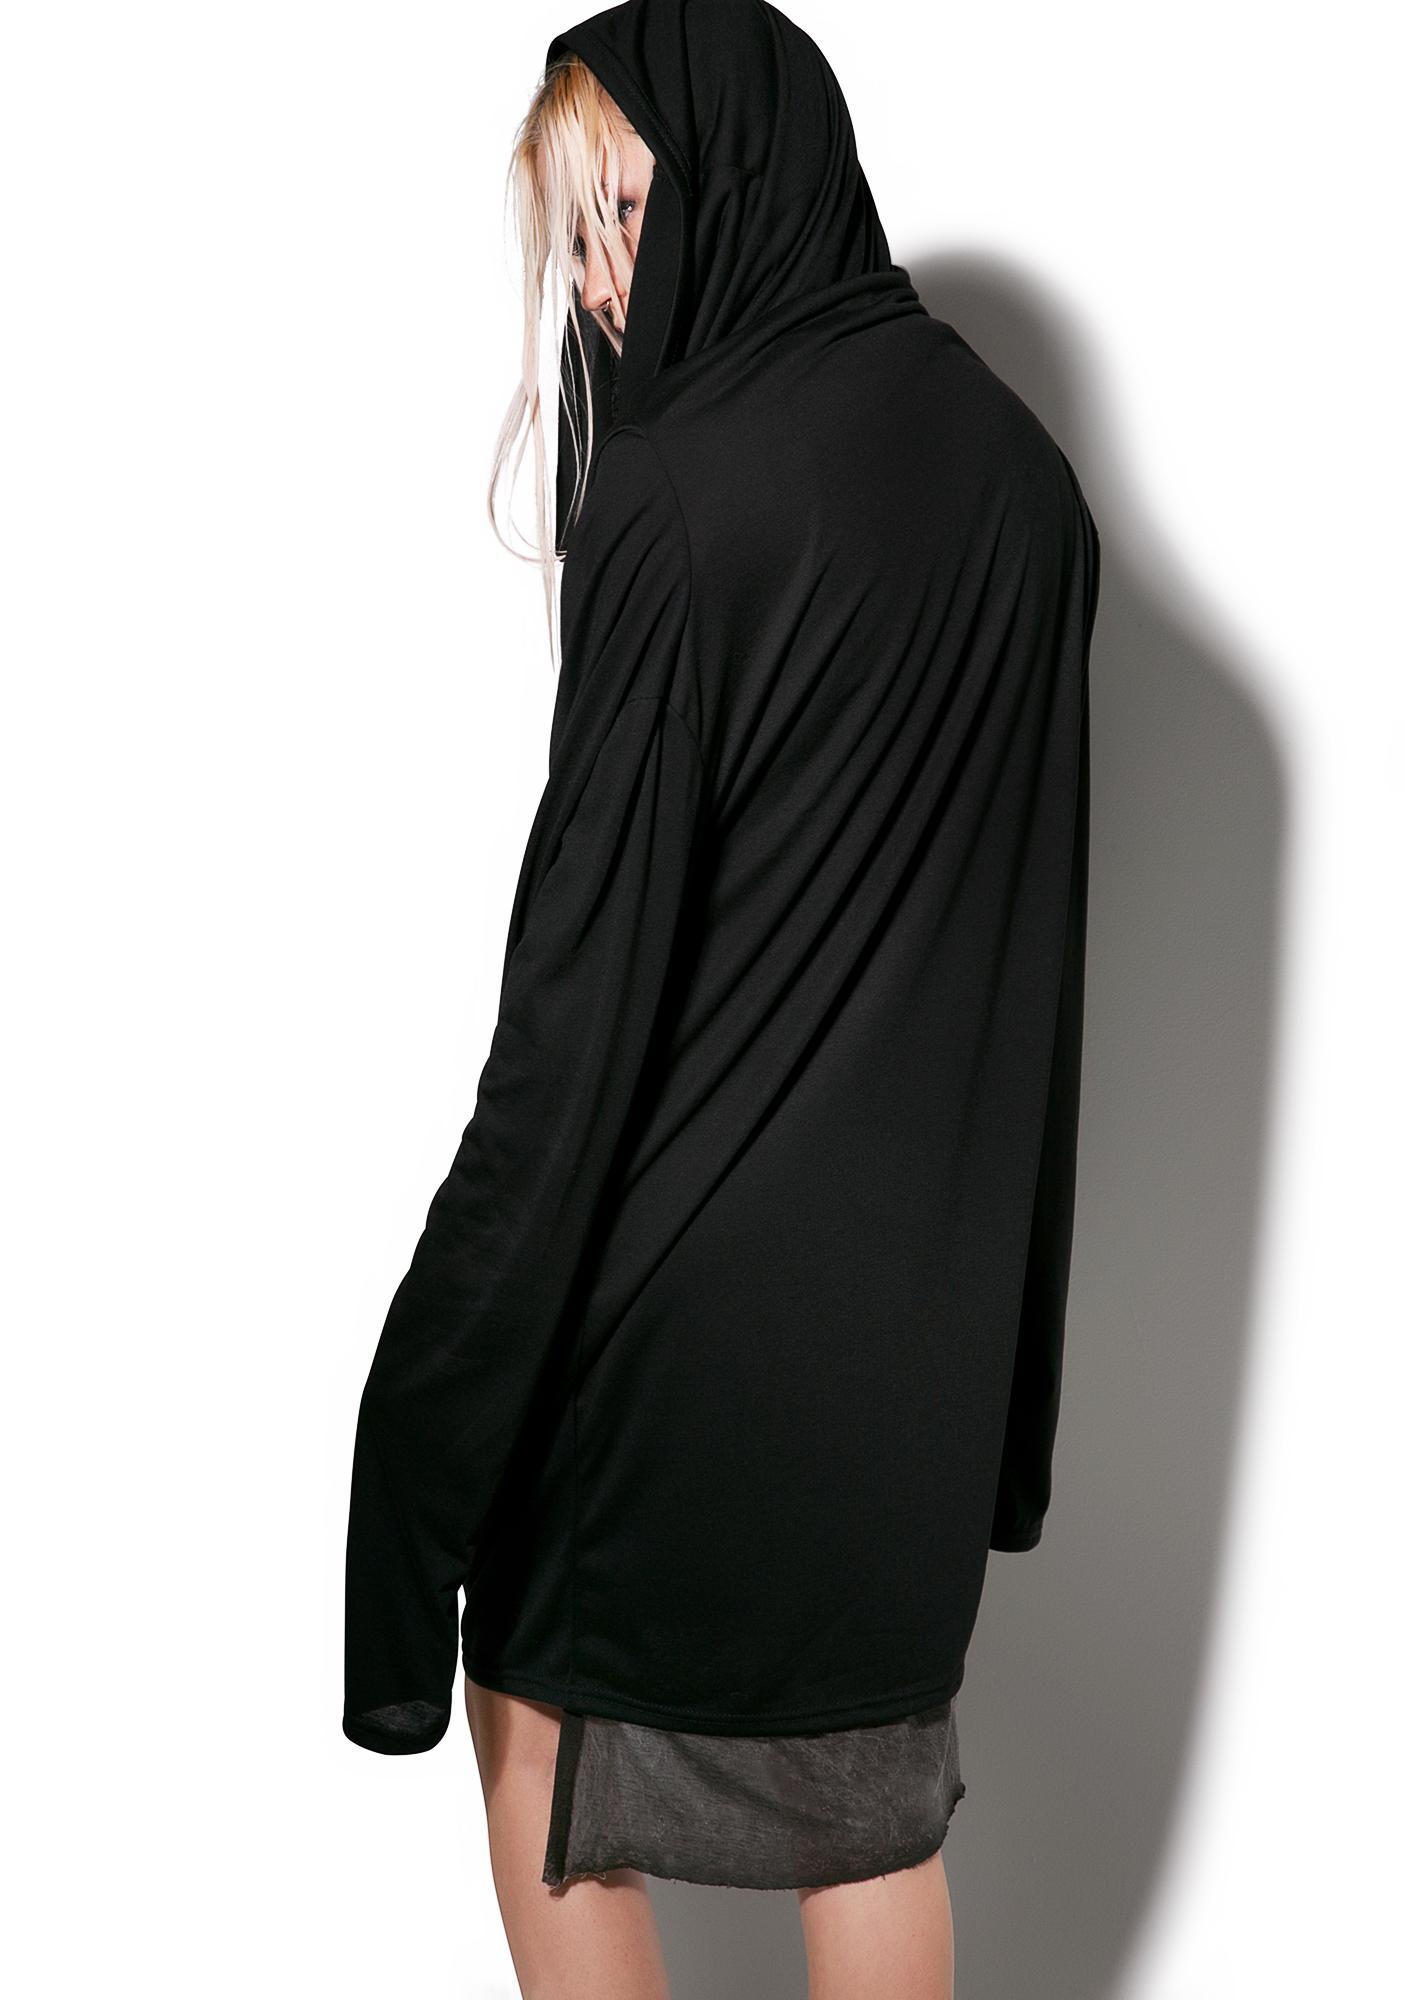 MNML Devil In A New Hooded Dress